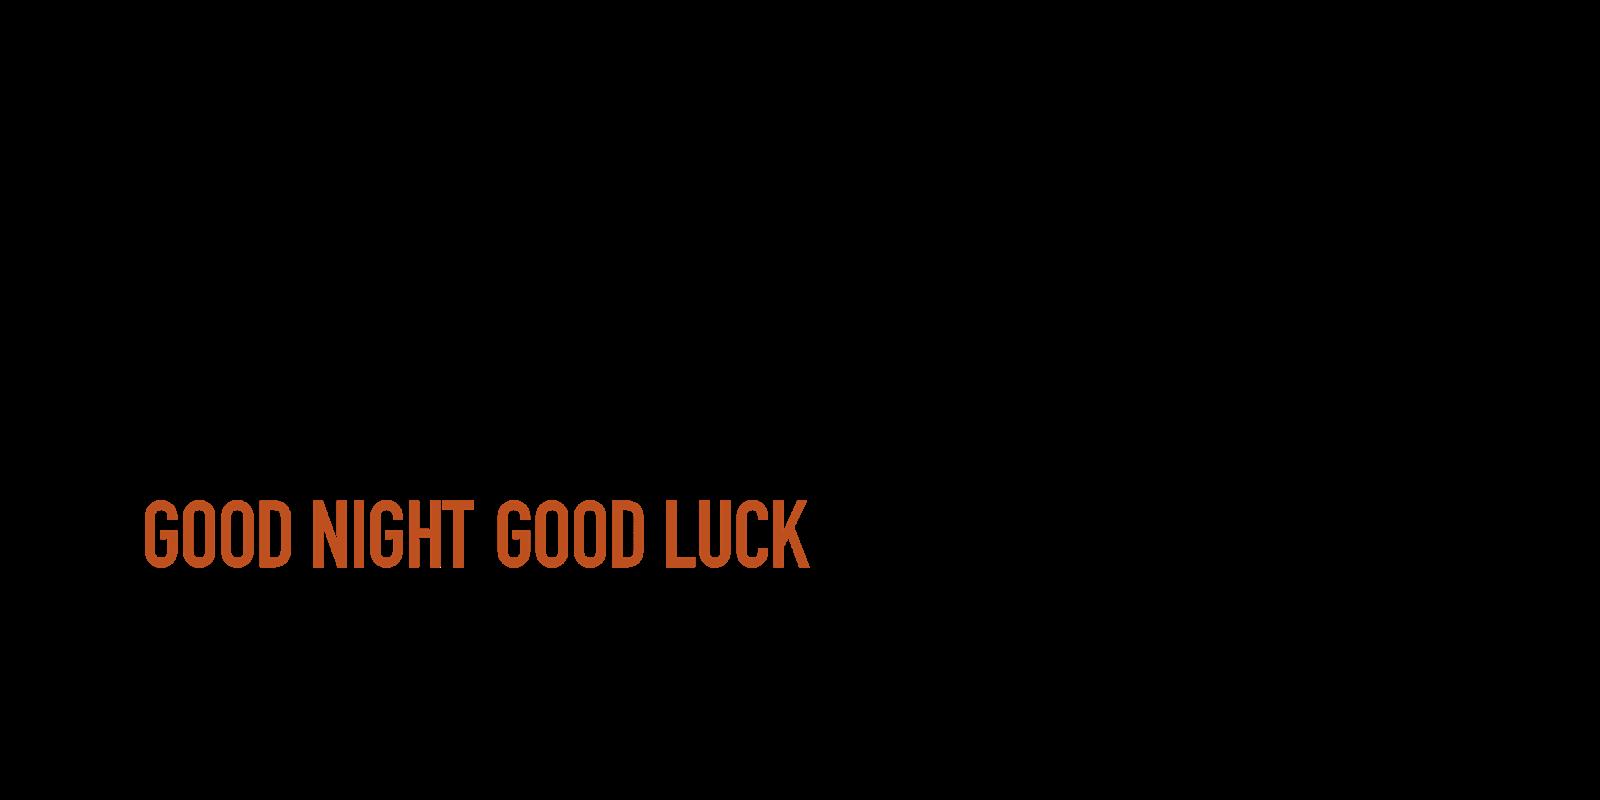 Dying Light Dev Tools Get an Update